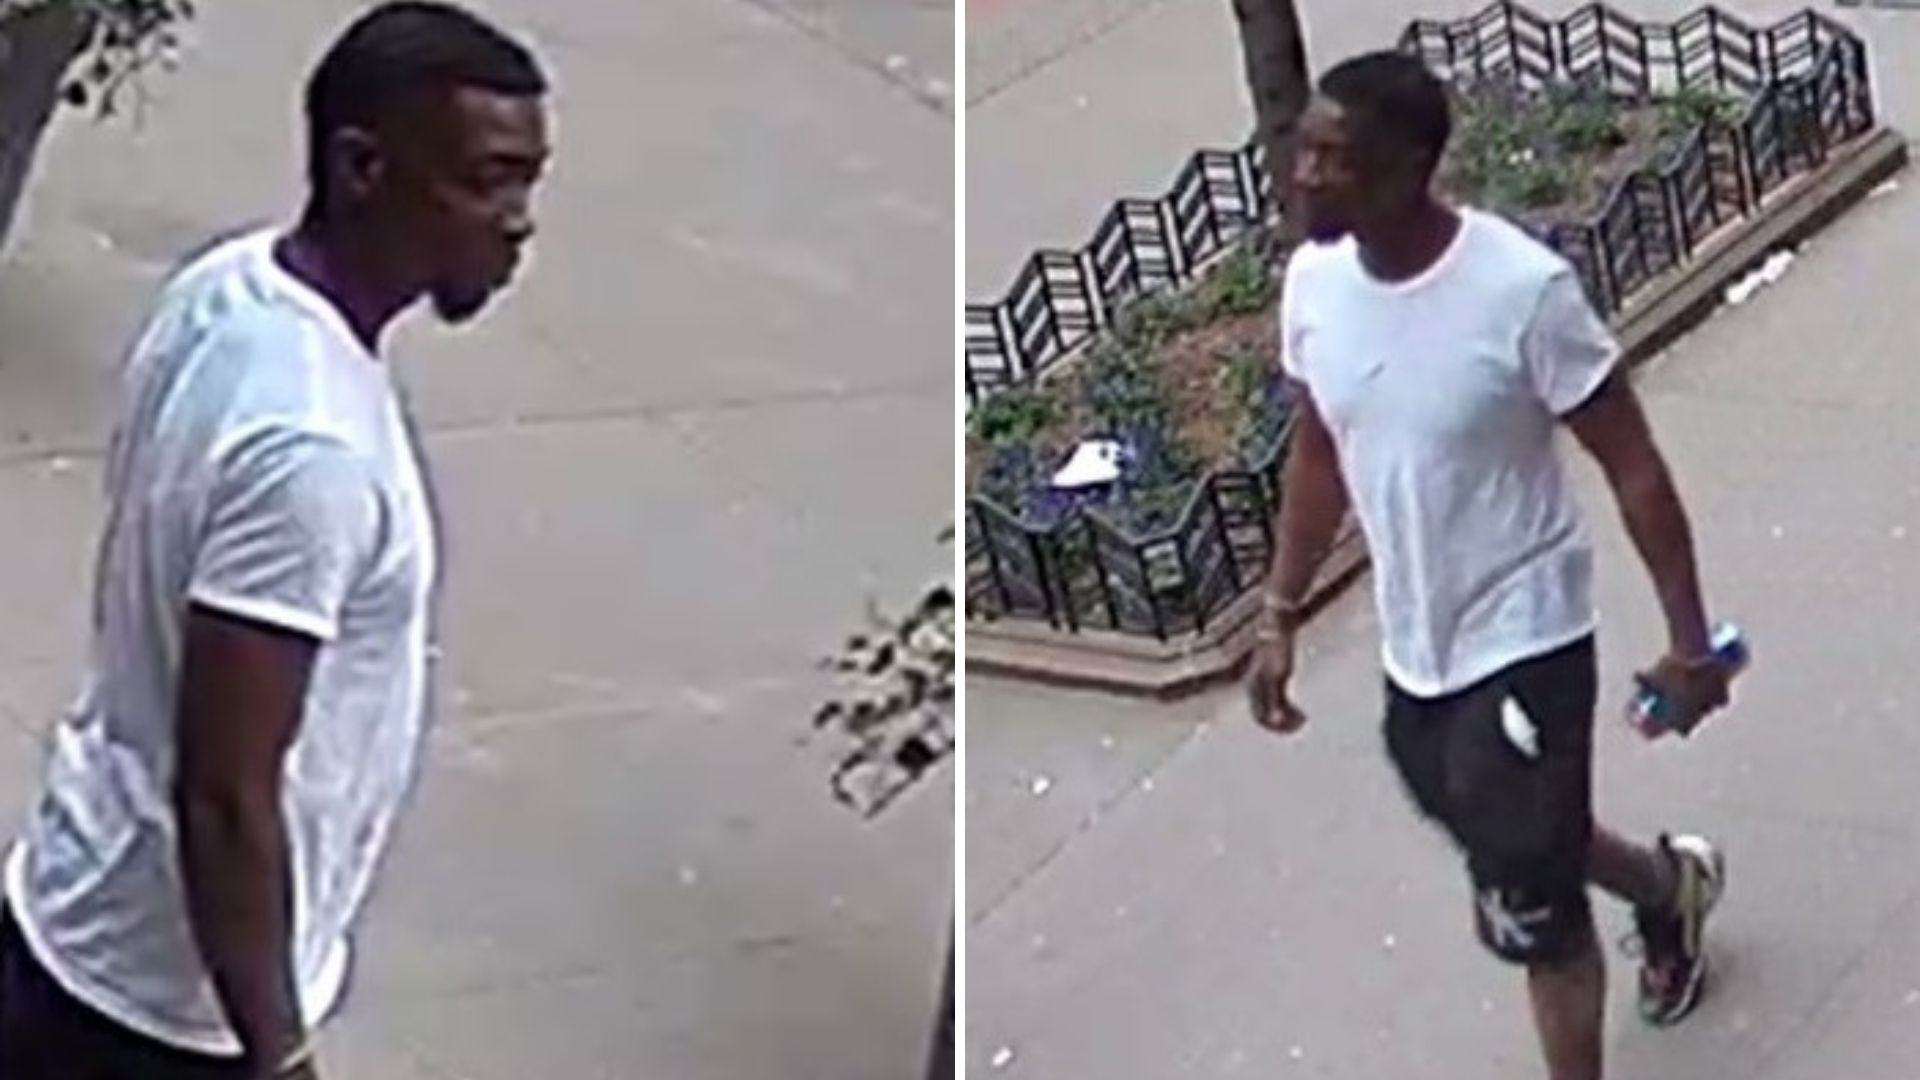 midtown cvs anti-gay attack suspect